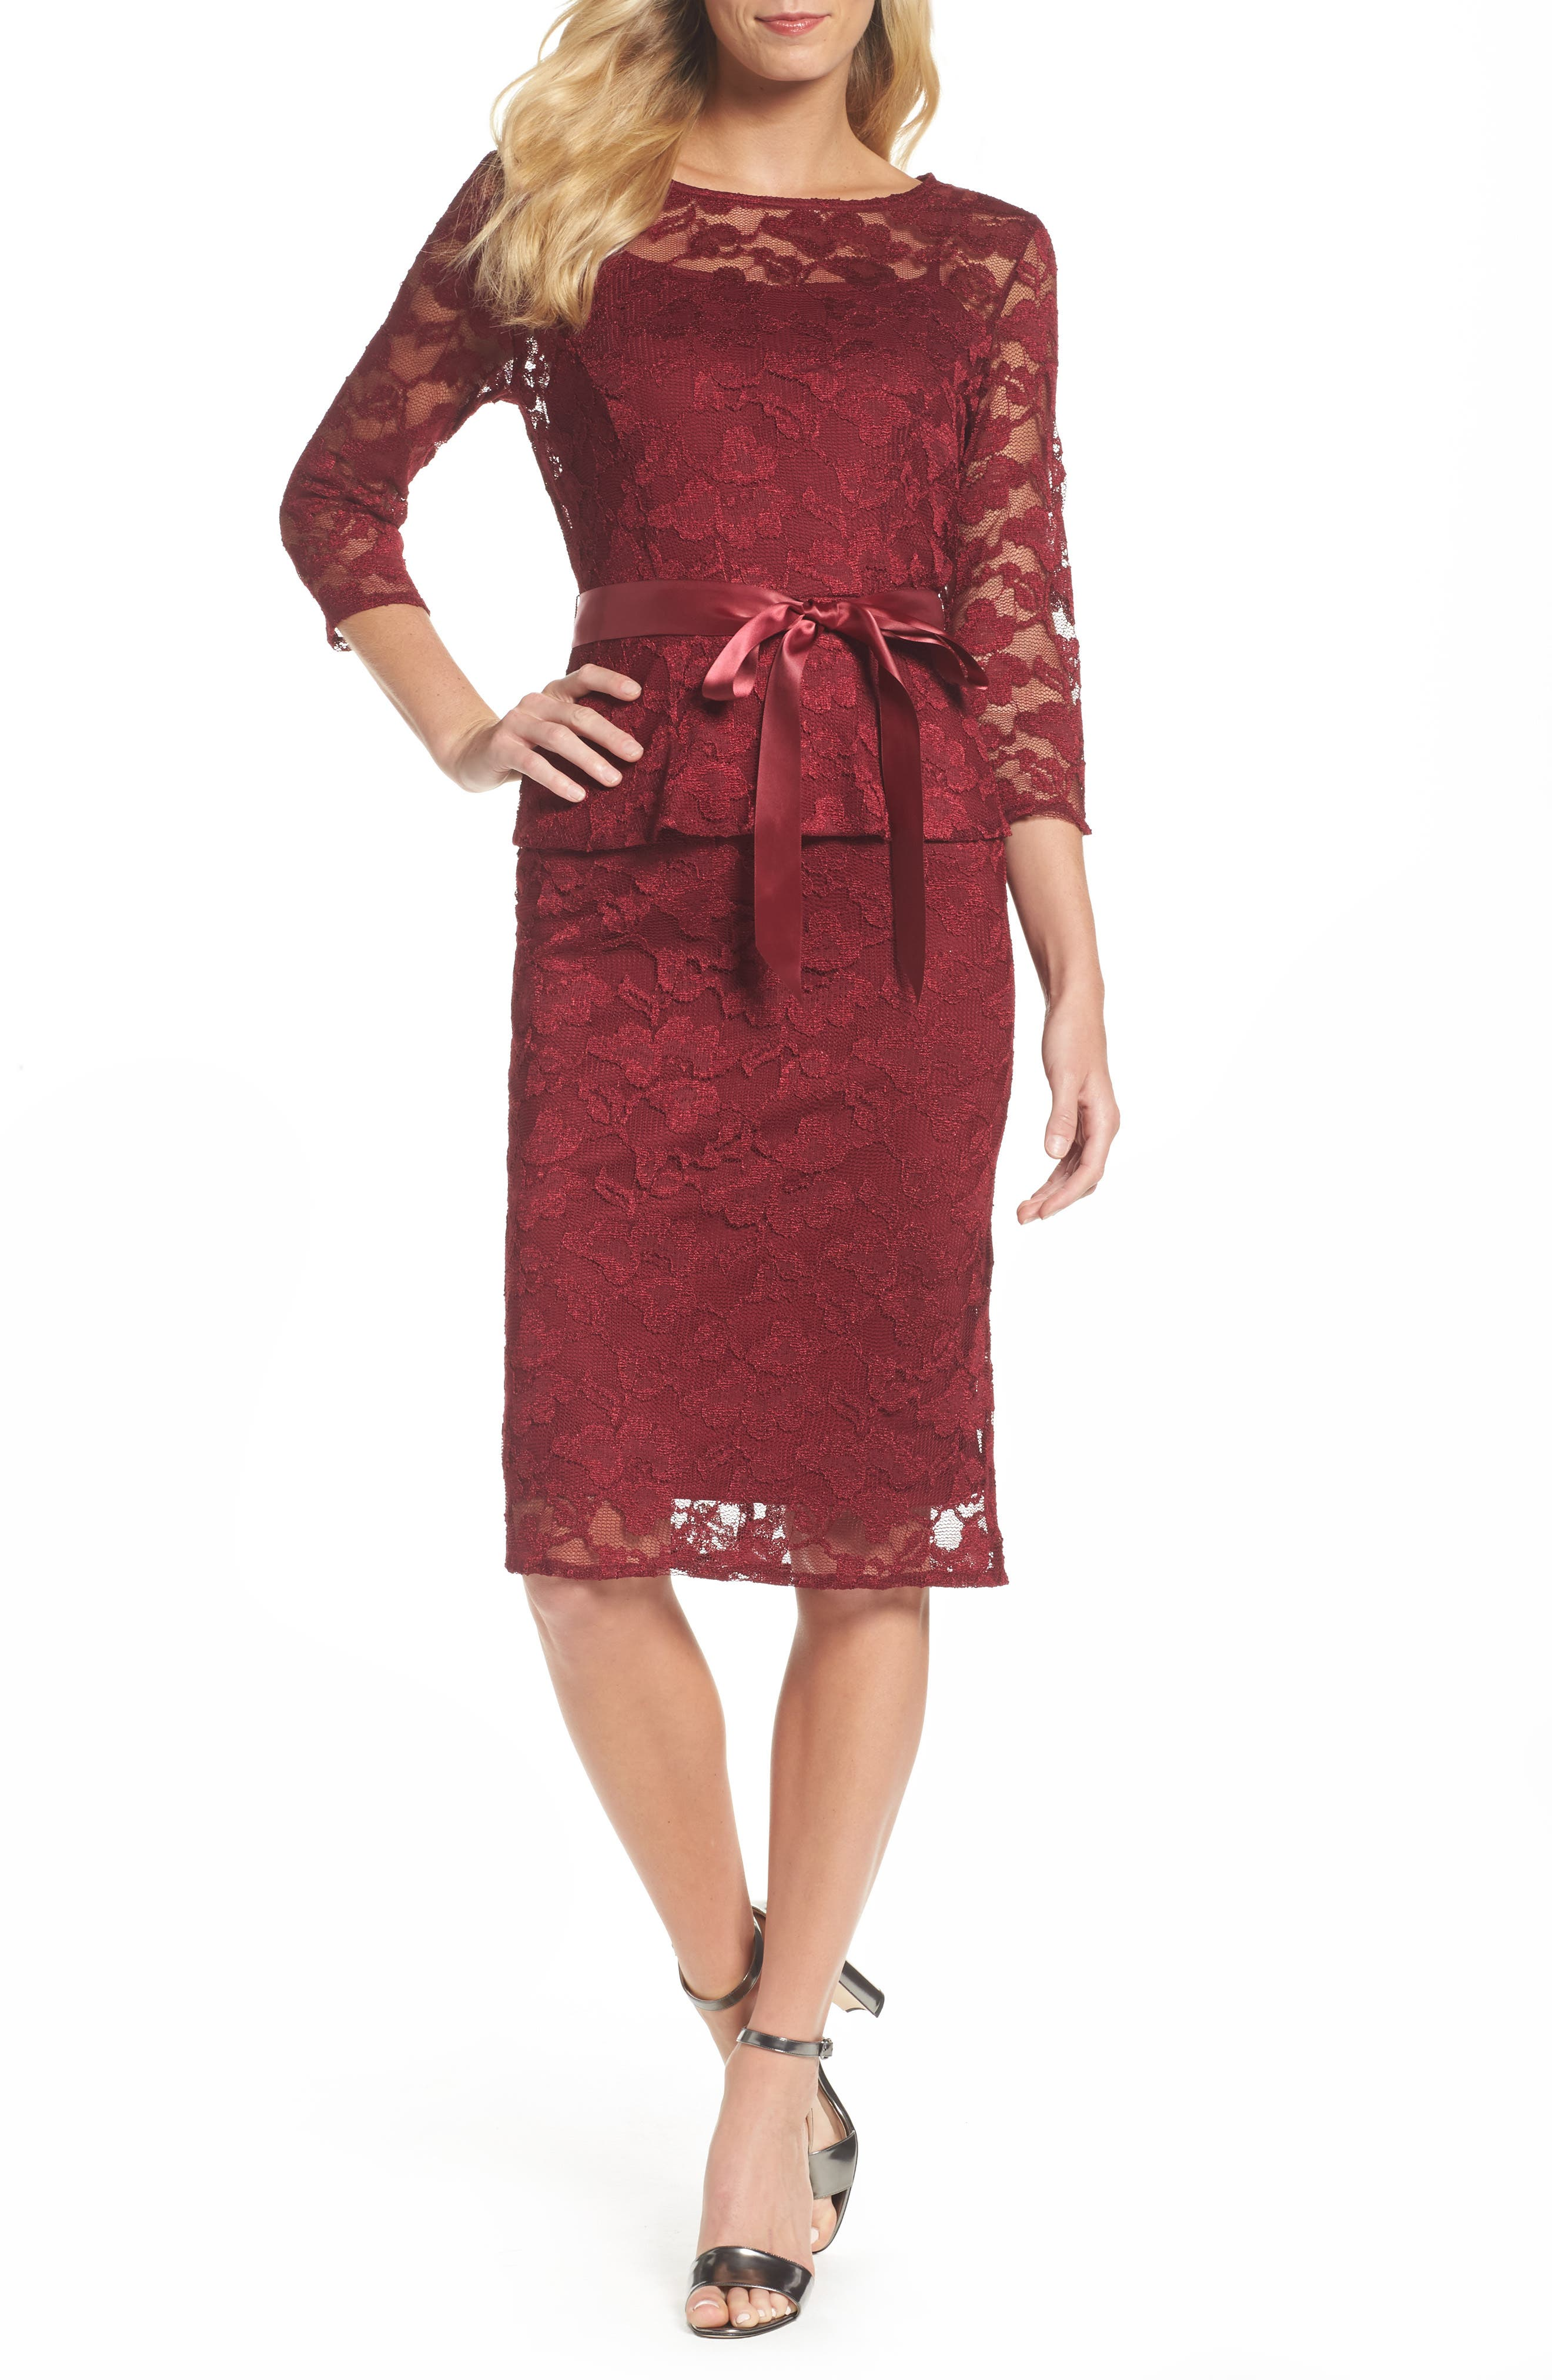 Chetta B Lace Sheath Dress